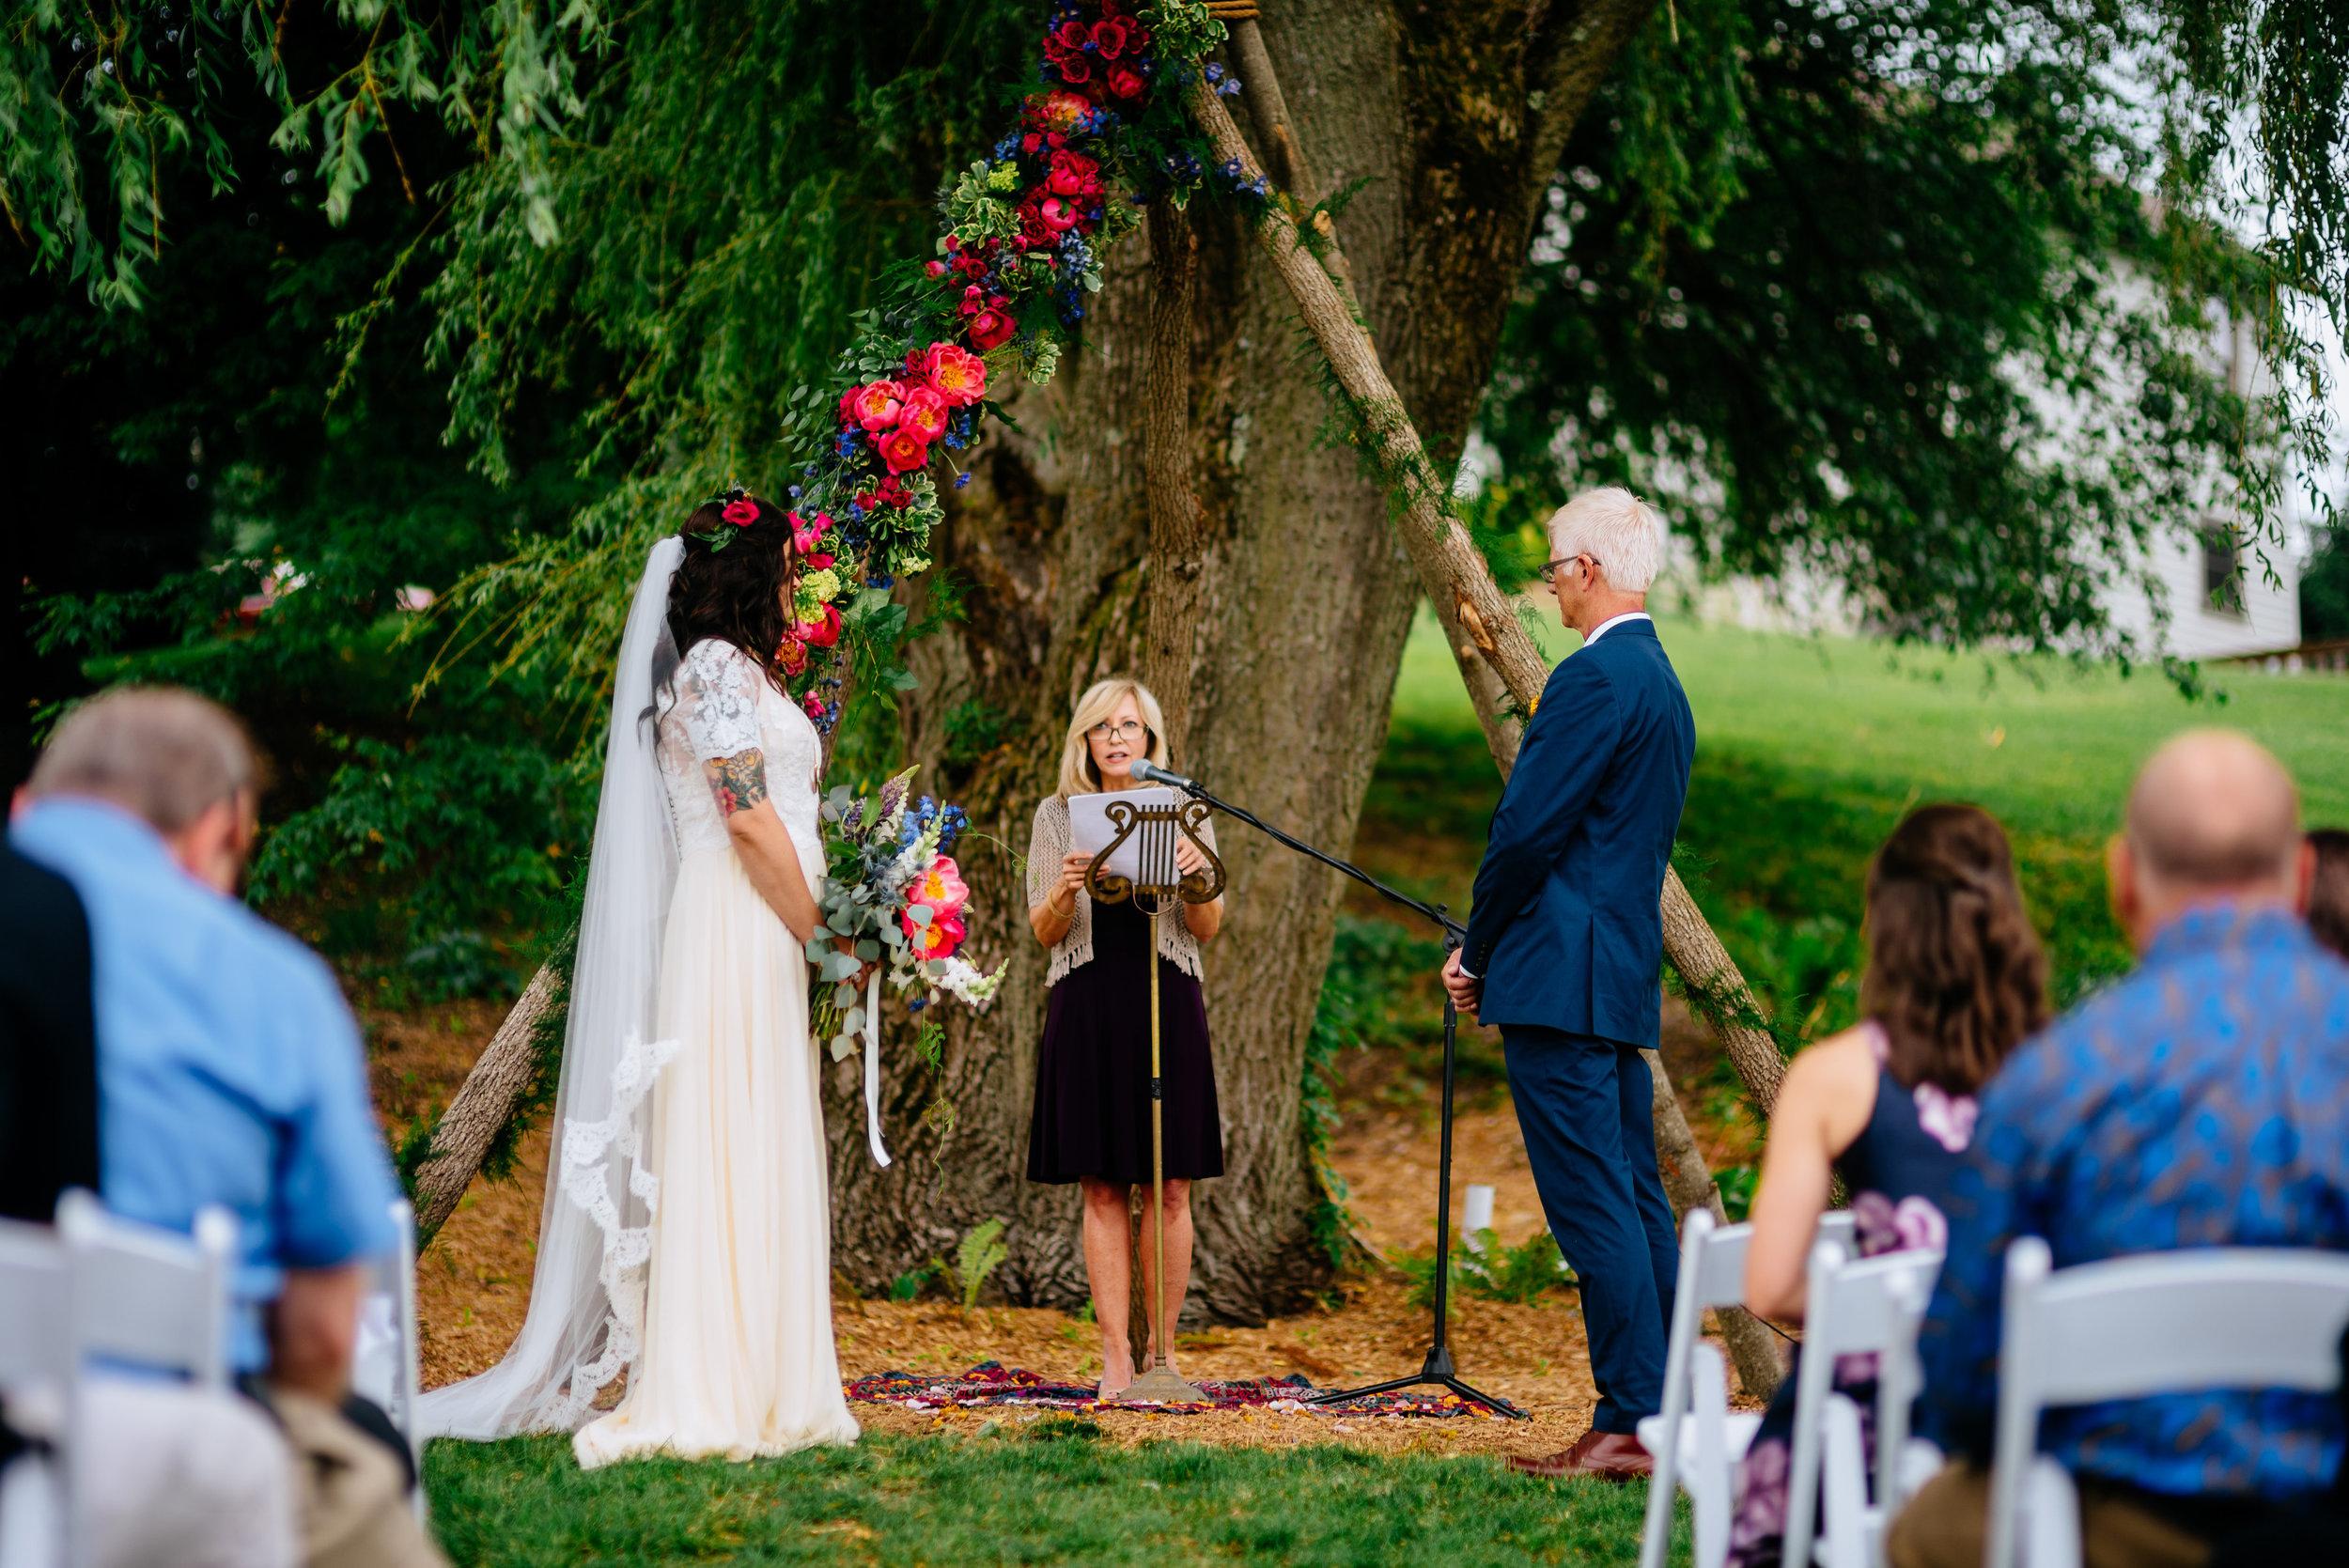 306-amanda-mark-wedding.jpg